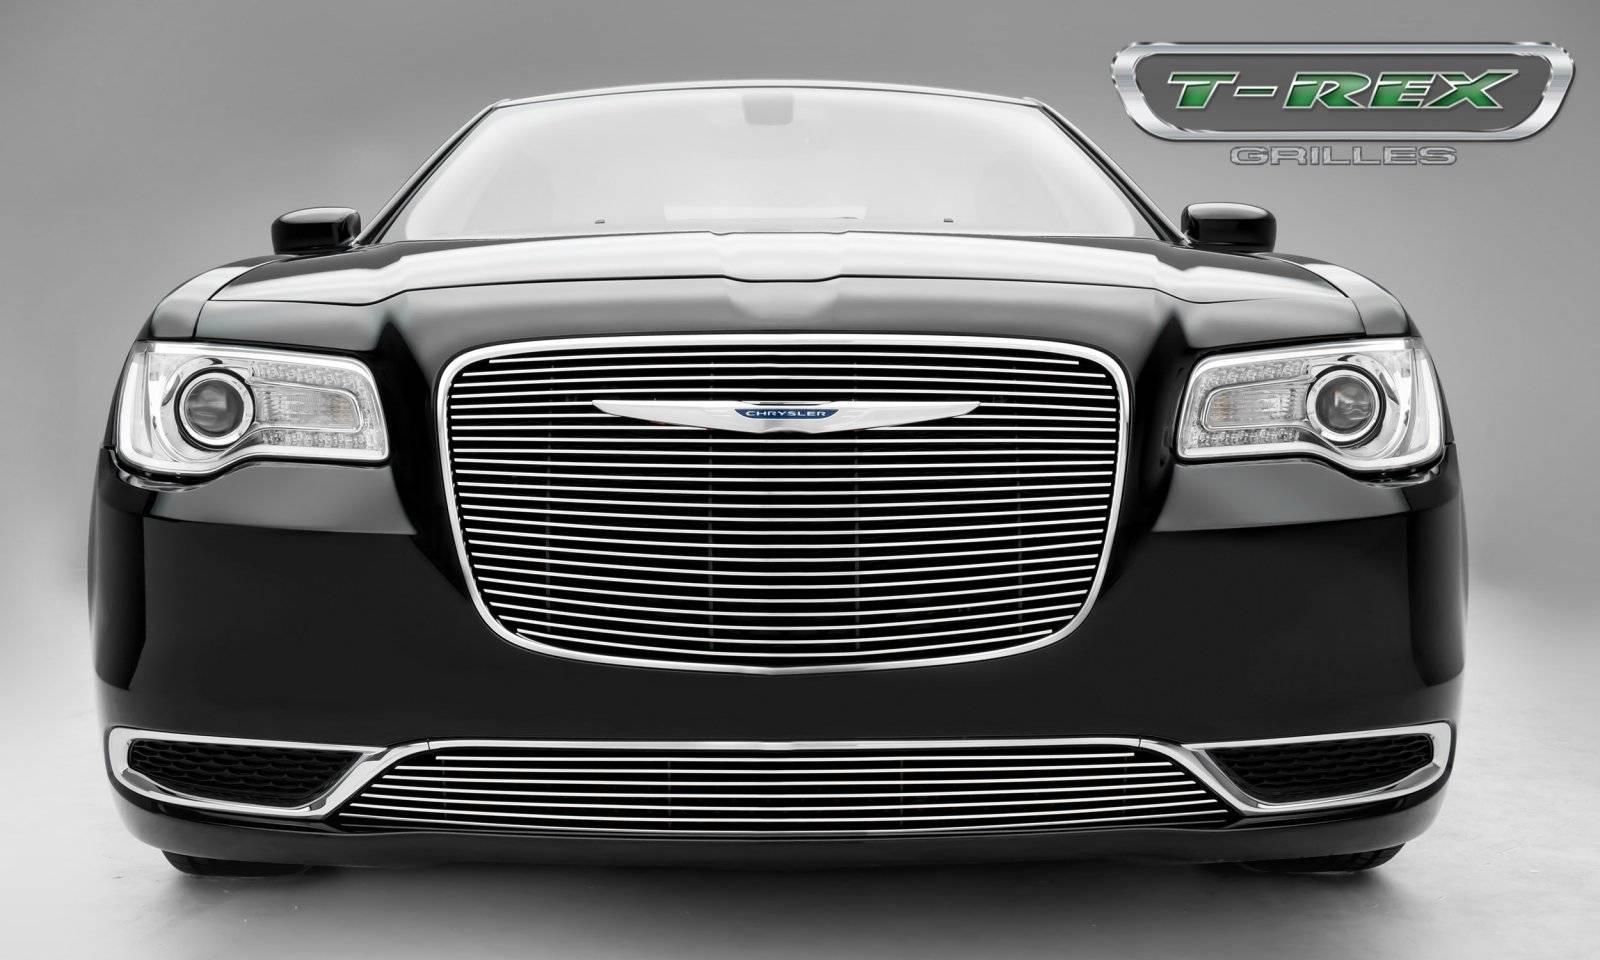 Chrysler 300 Billet Series Main Grille Overlay With Black Powder